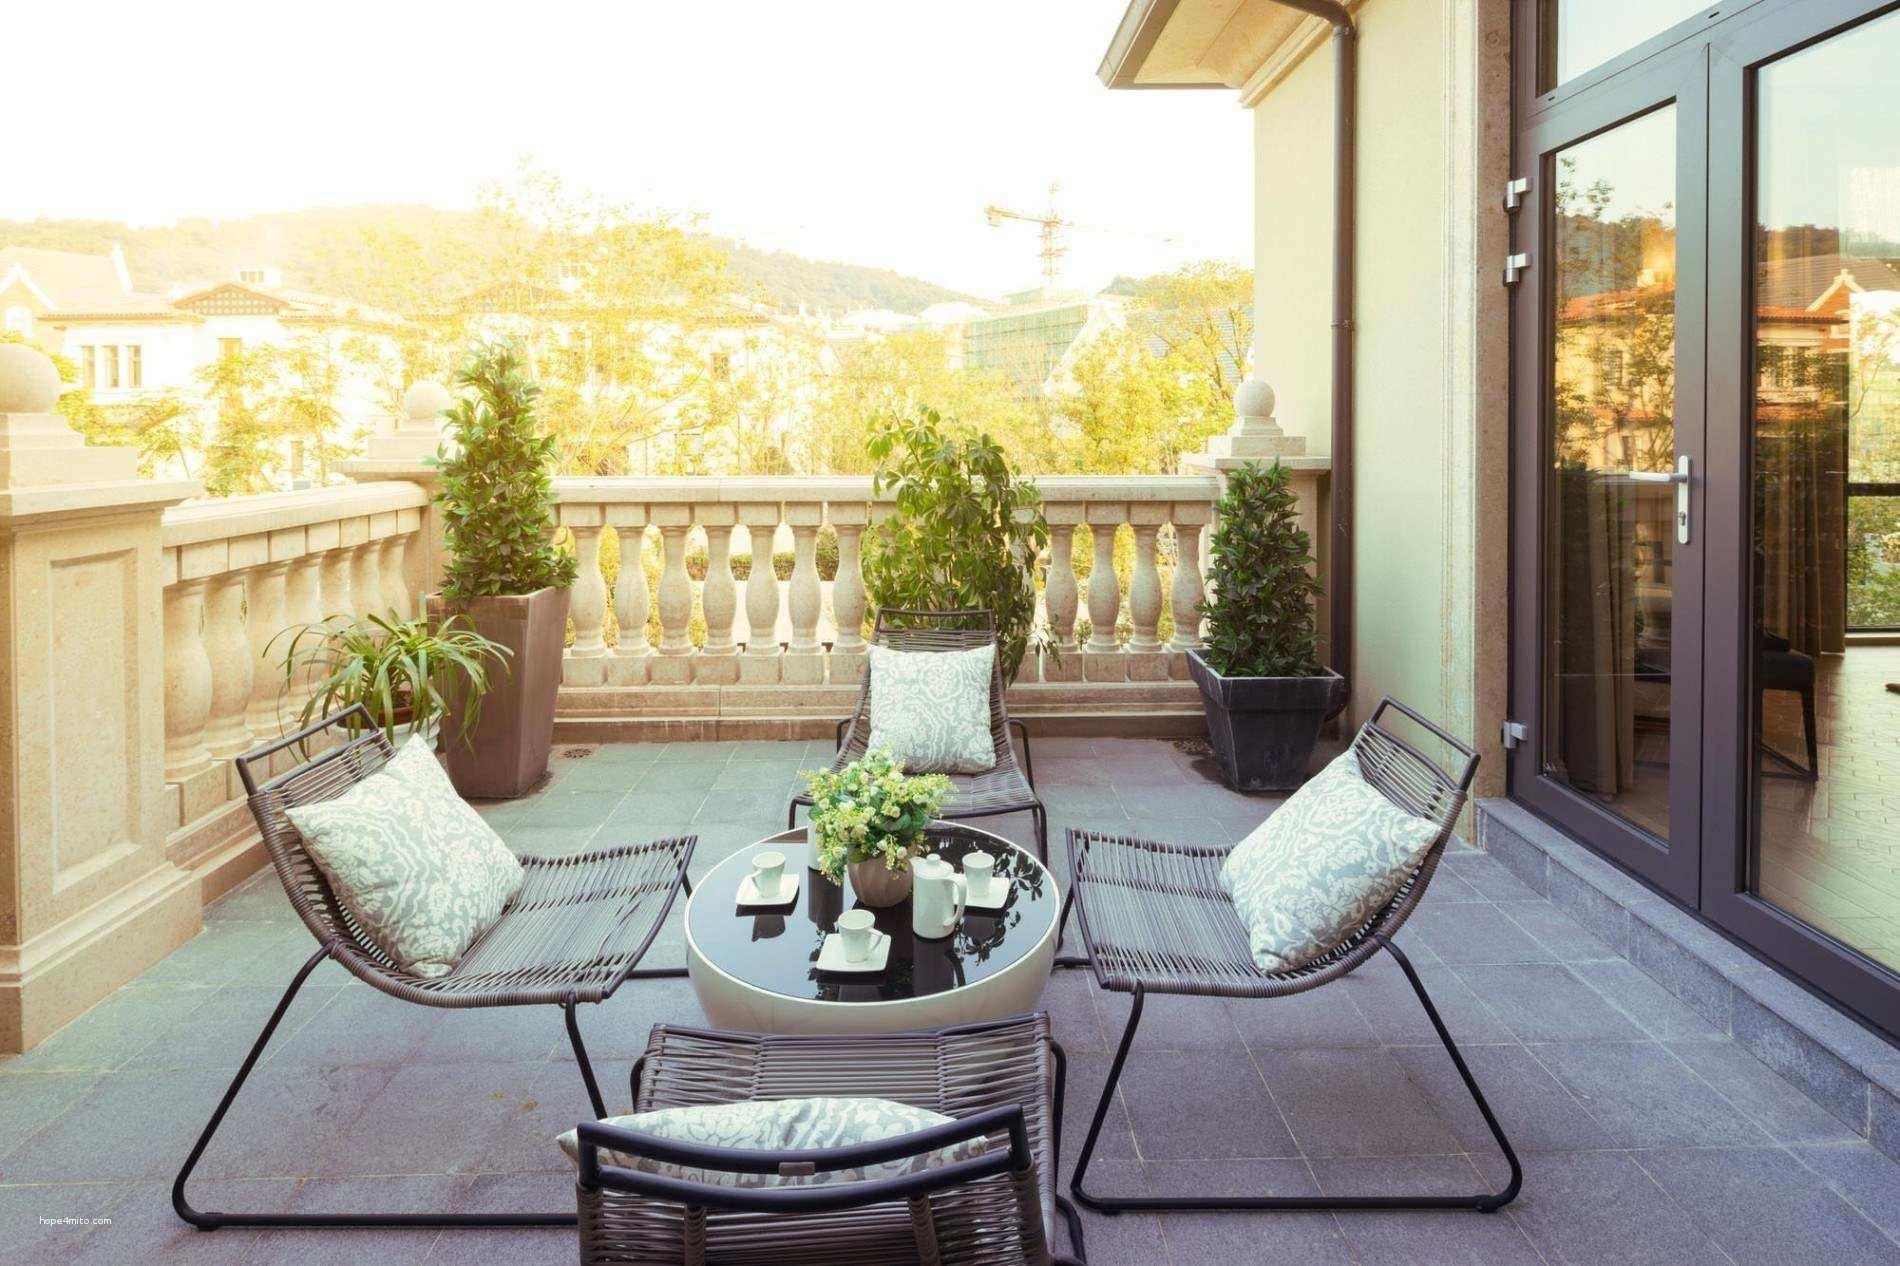 holz deko ideen genial 35 genial deko balkon ideen of holz deko ideen